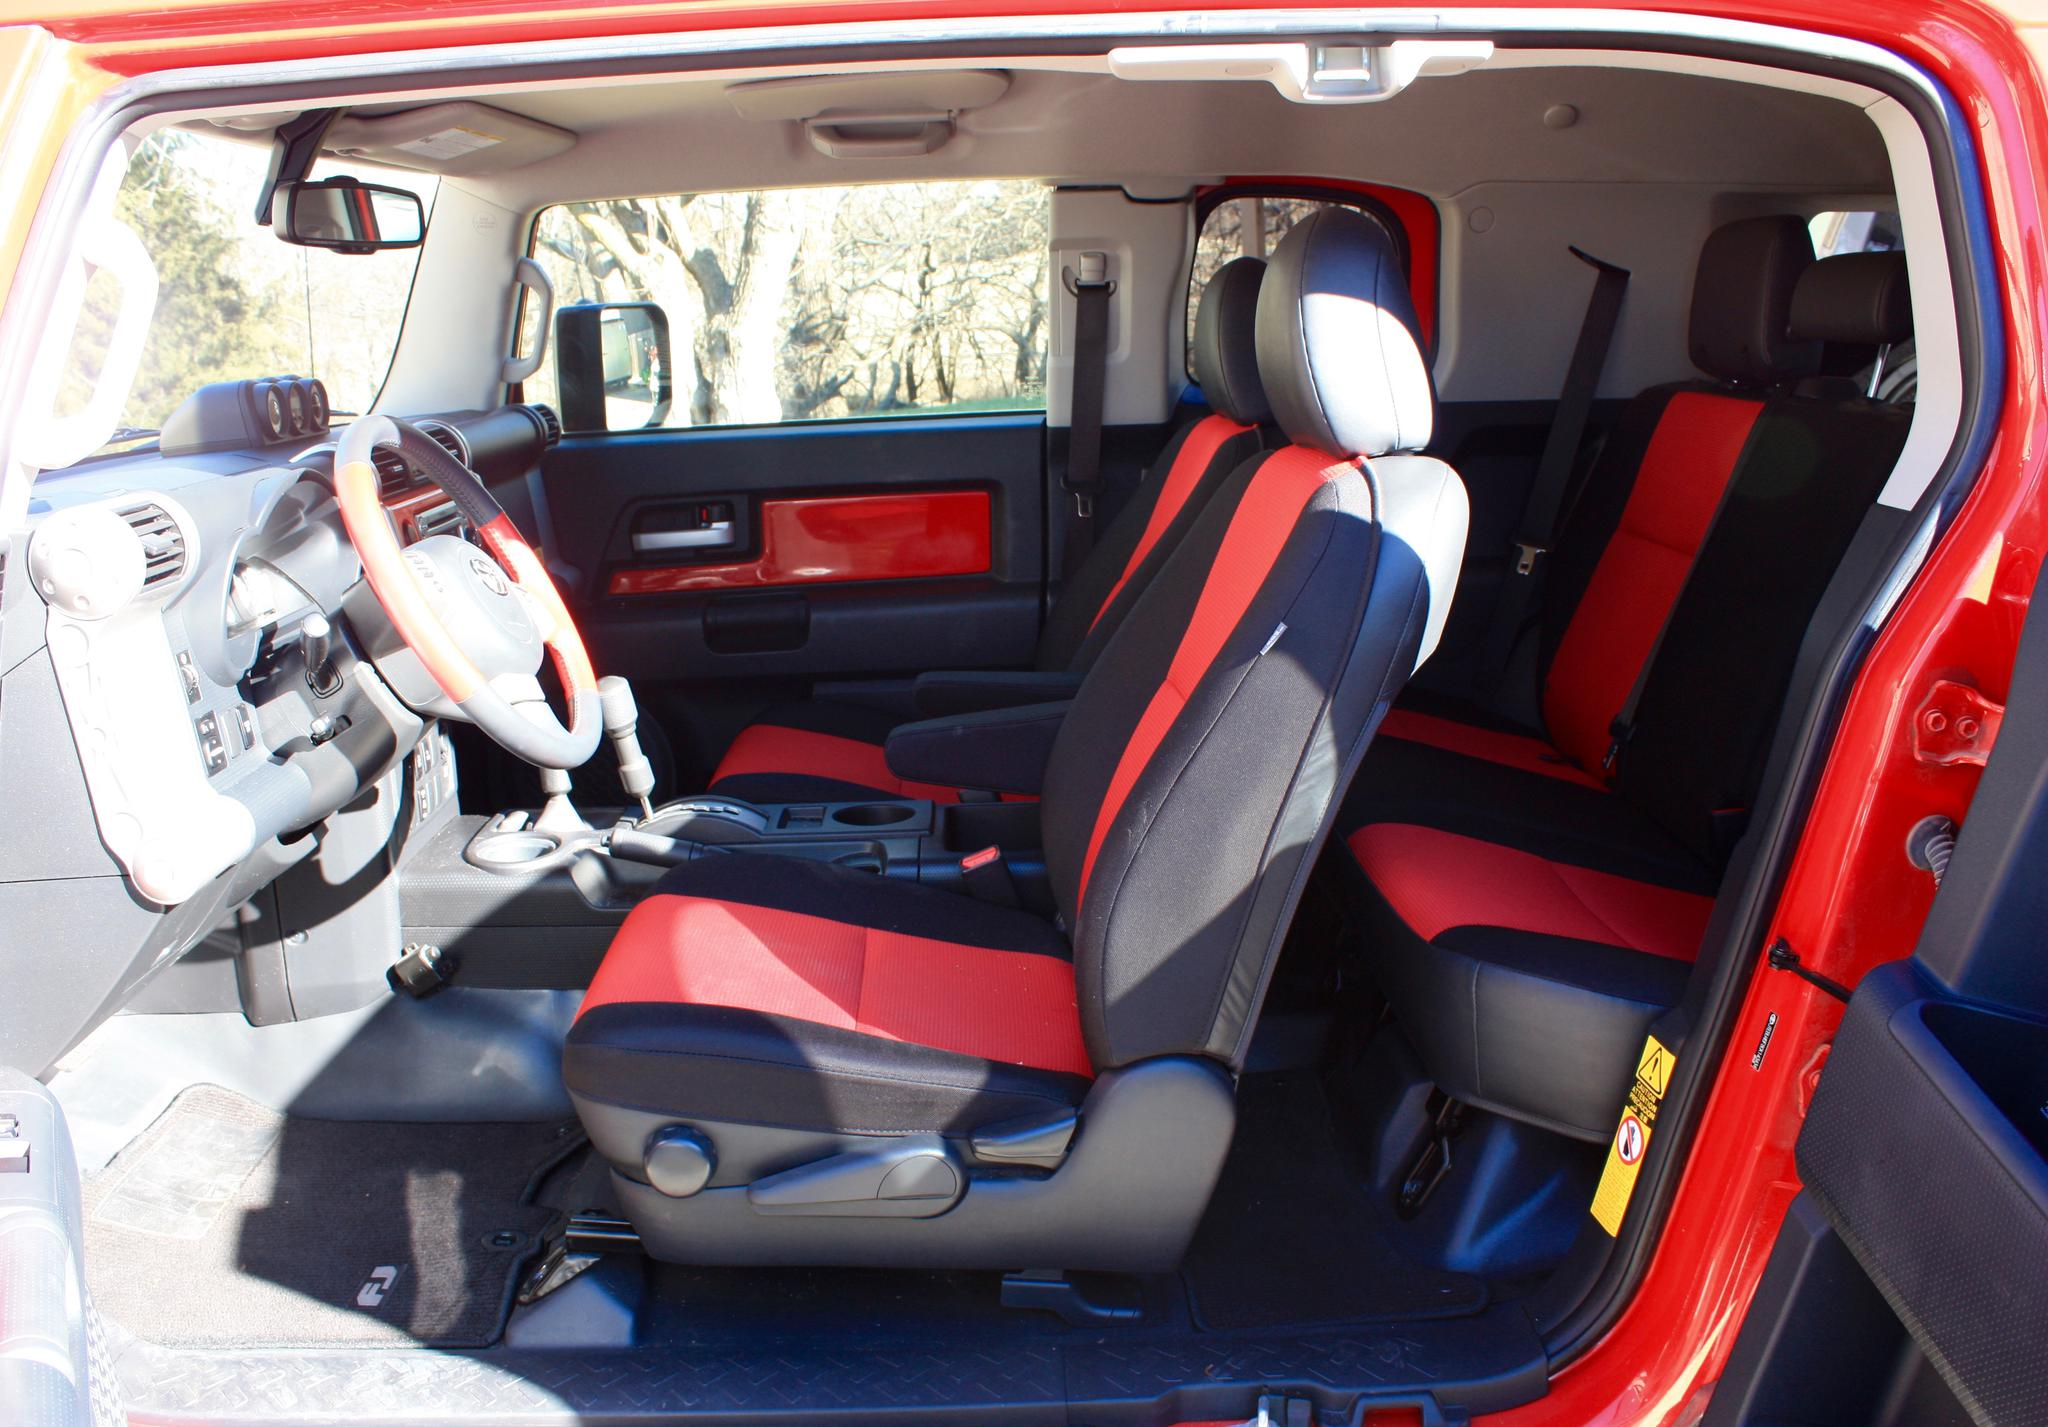 2012 Trail Team Edition Red FJ for Sale - Toyota FJ ...